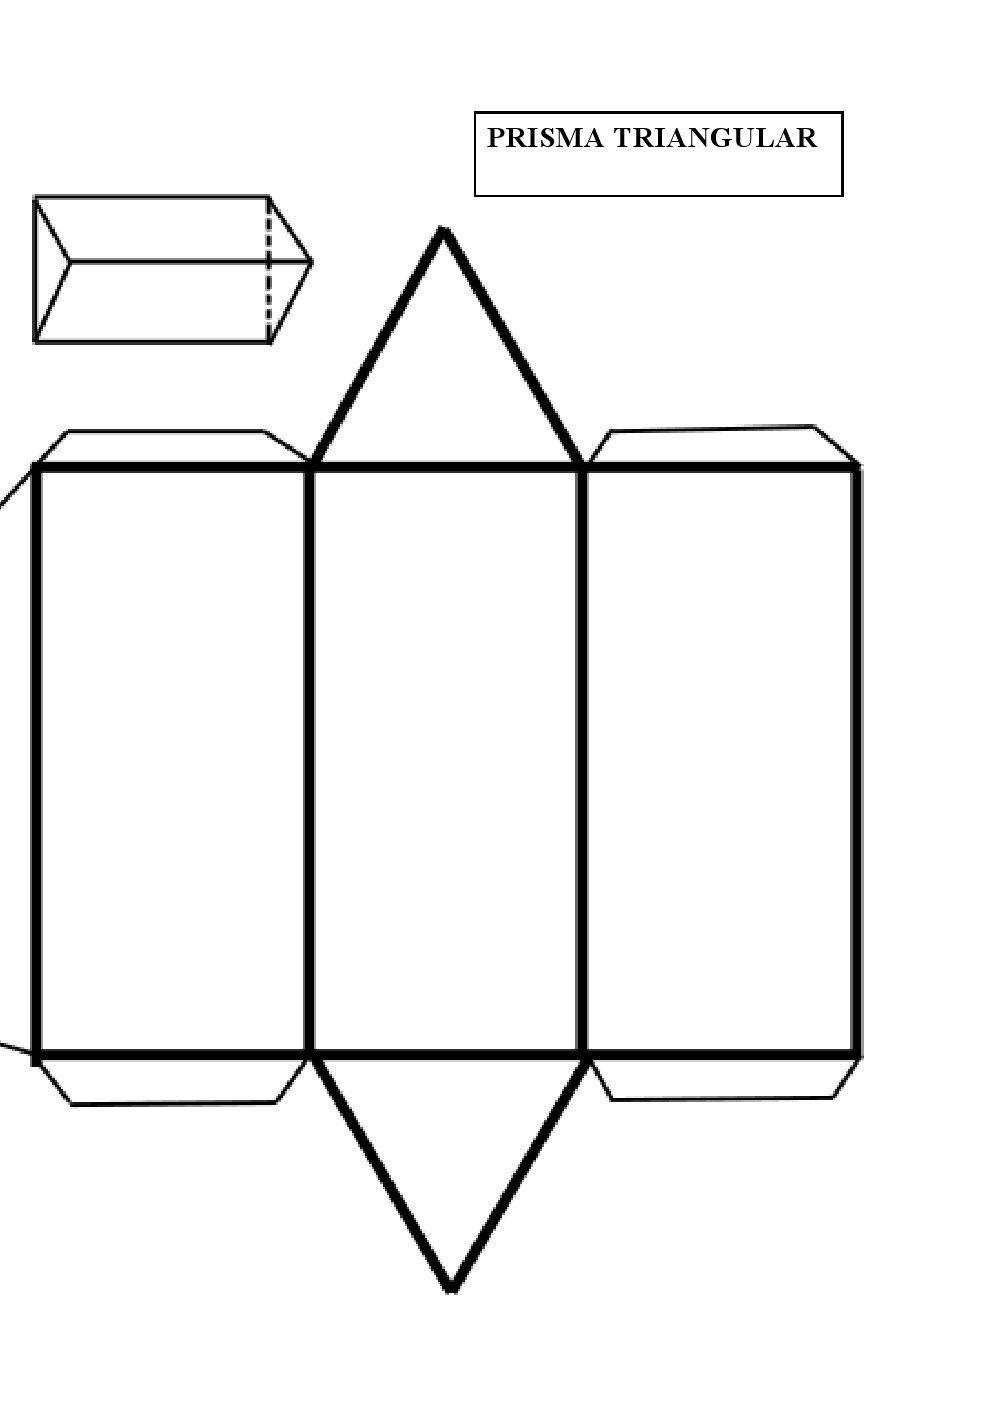 prisma triangular figura el prisma pinterest geometría